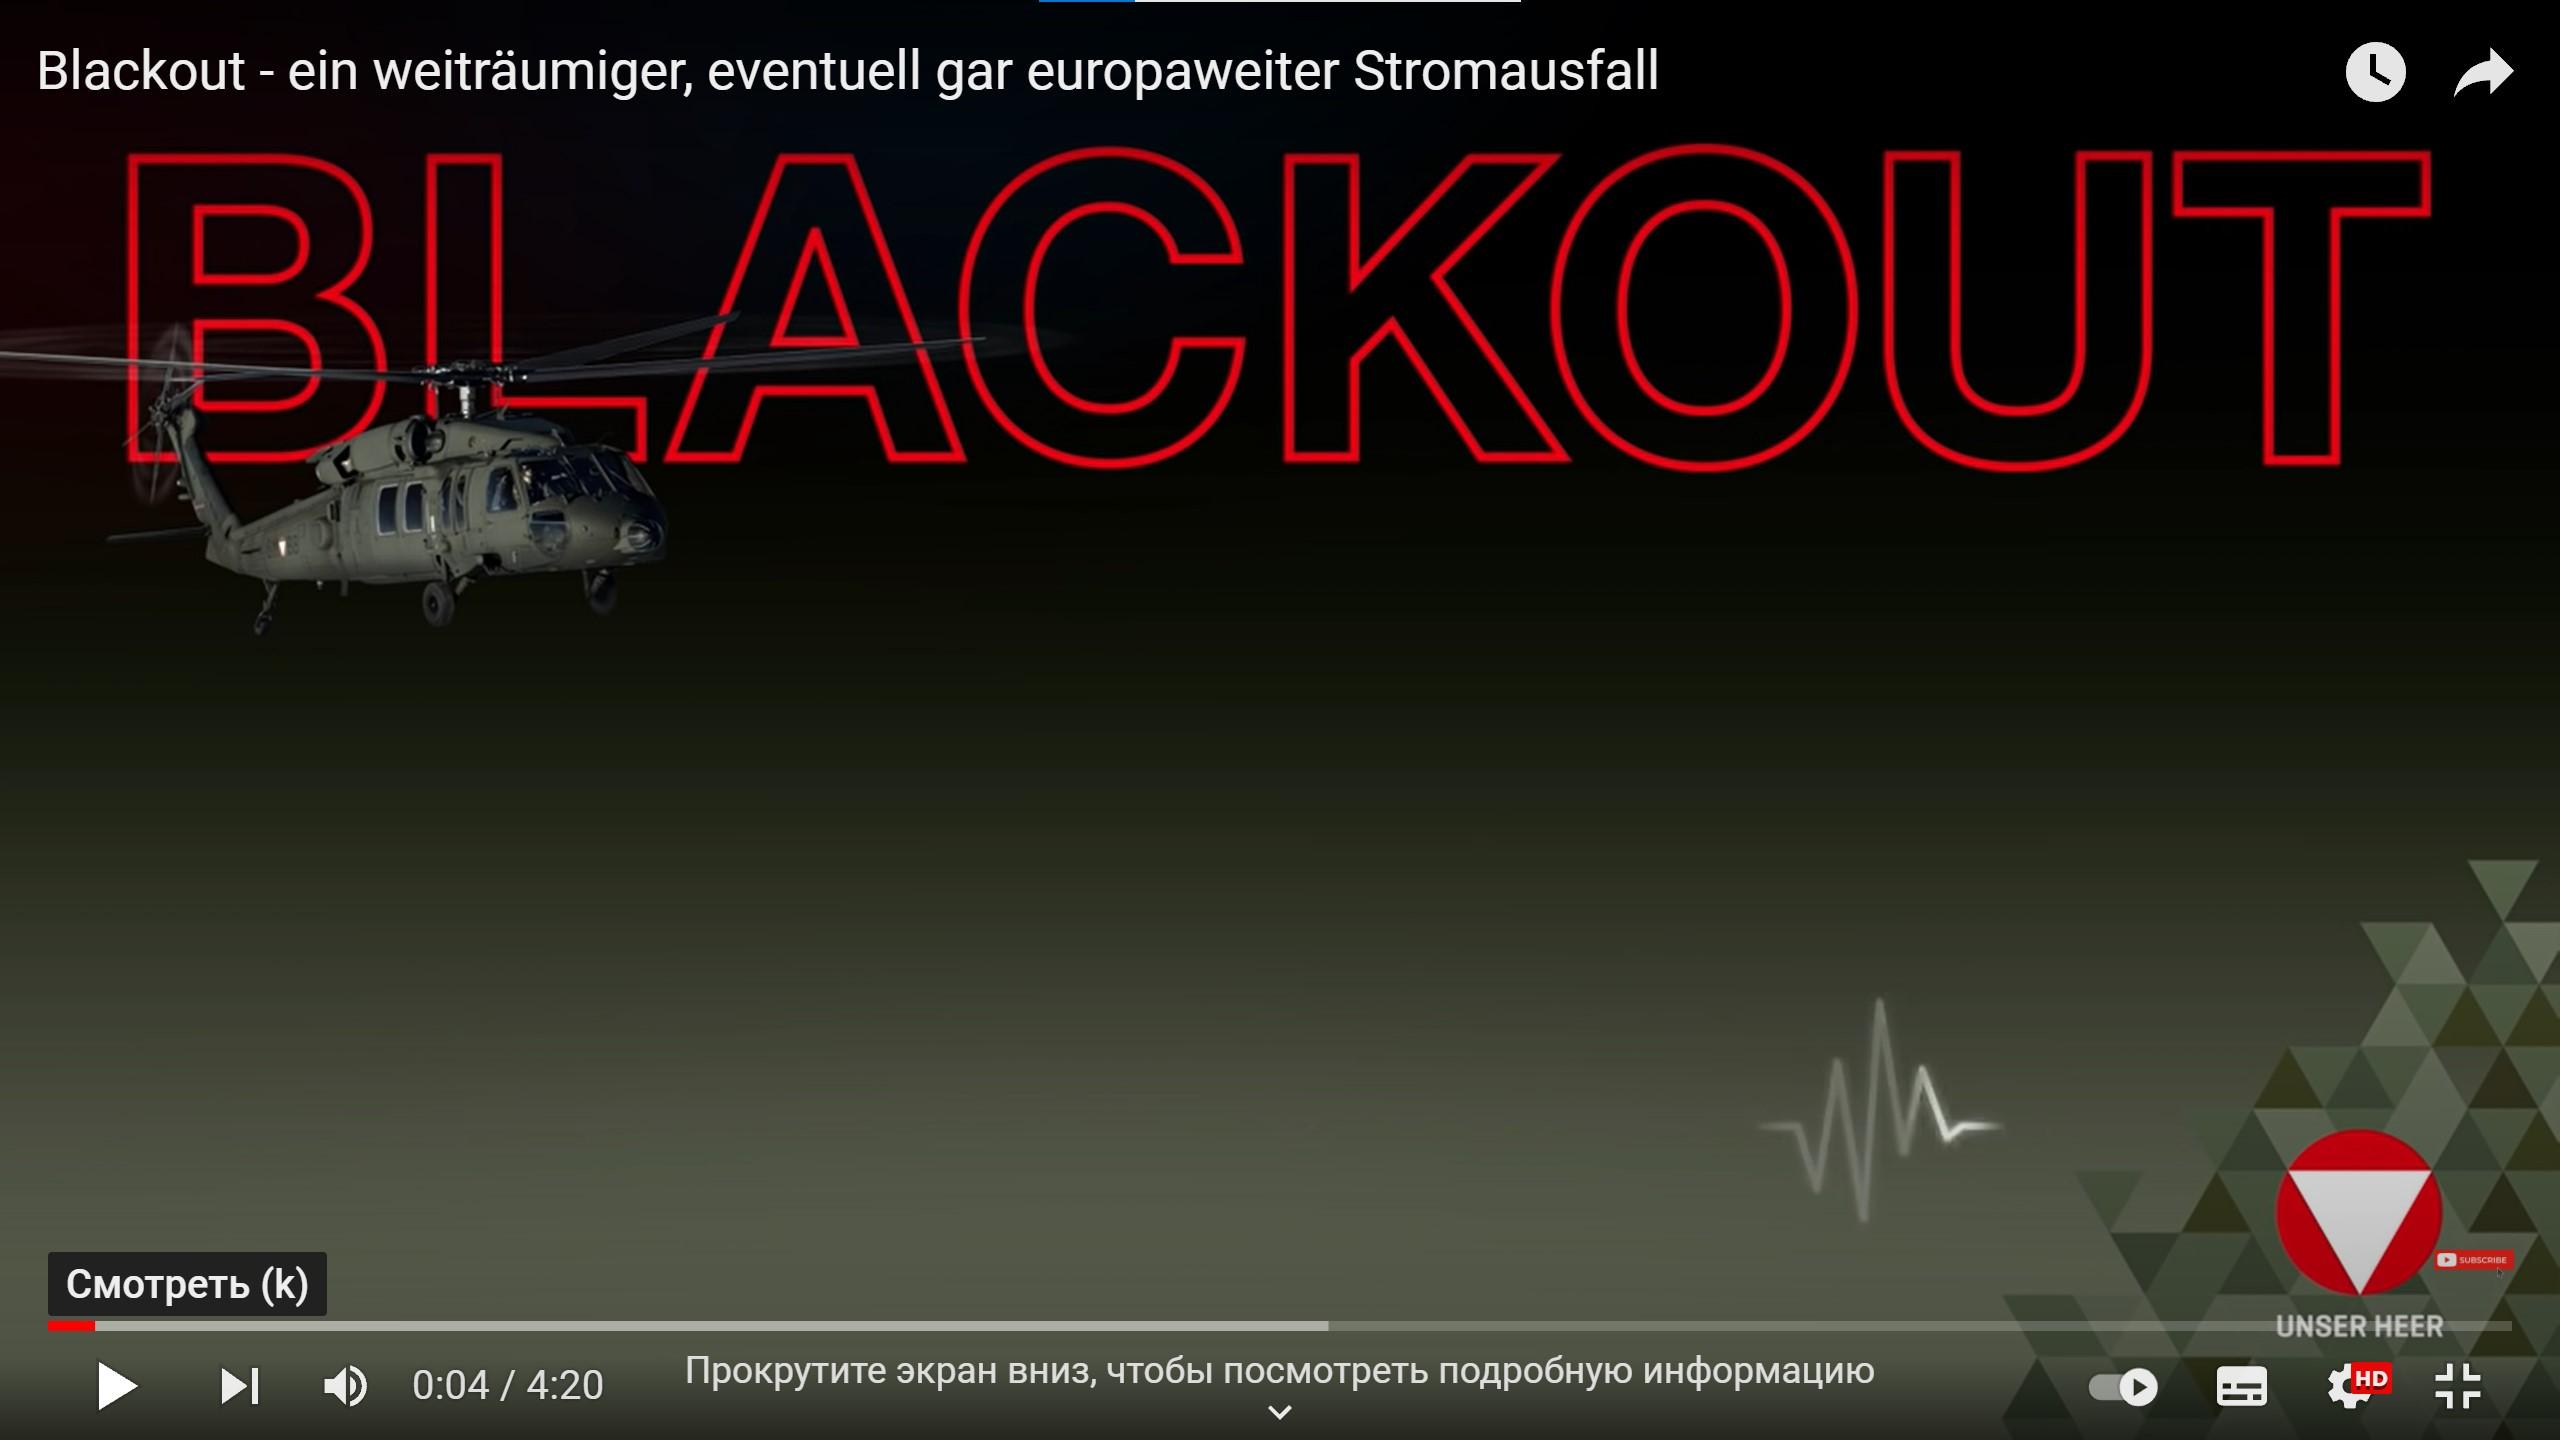 Армия Австрии предупредила: грядет отключение электричества во всей Европе